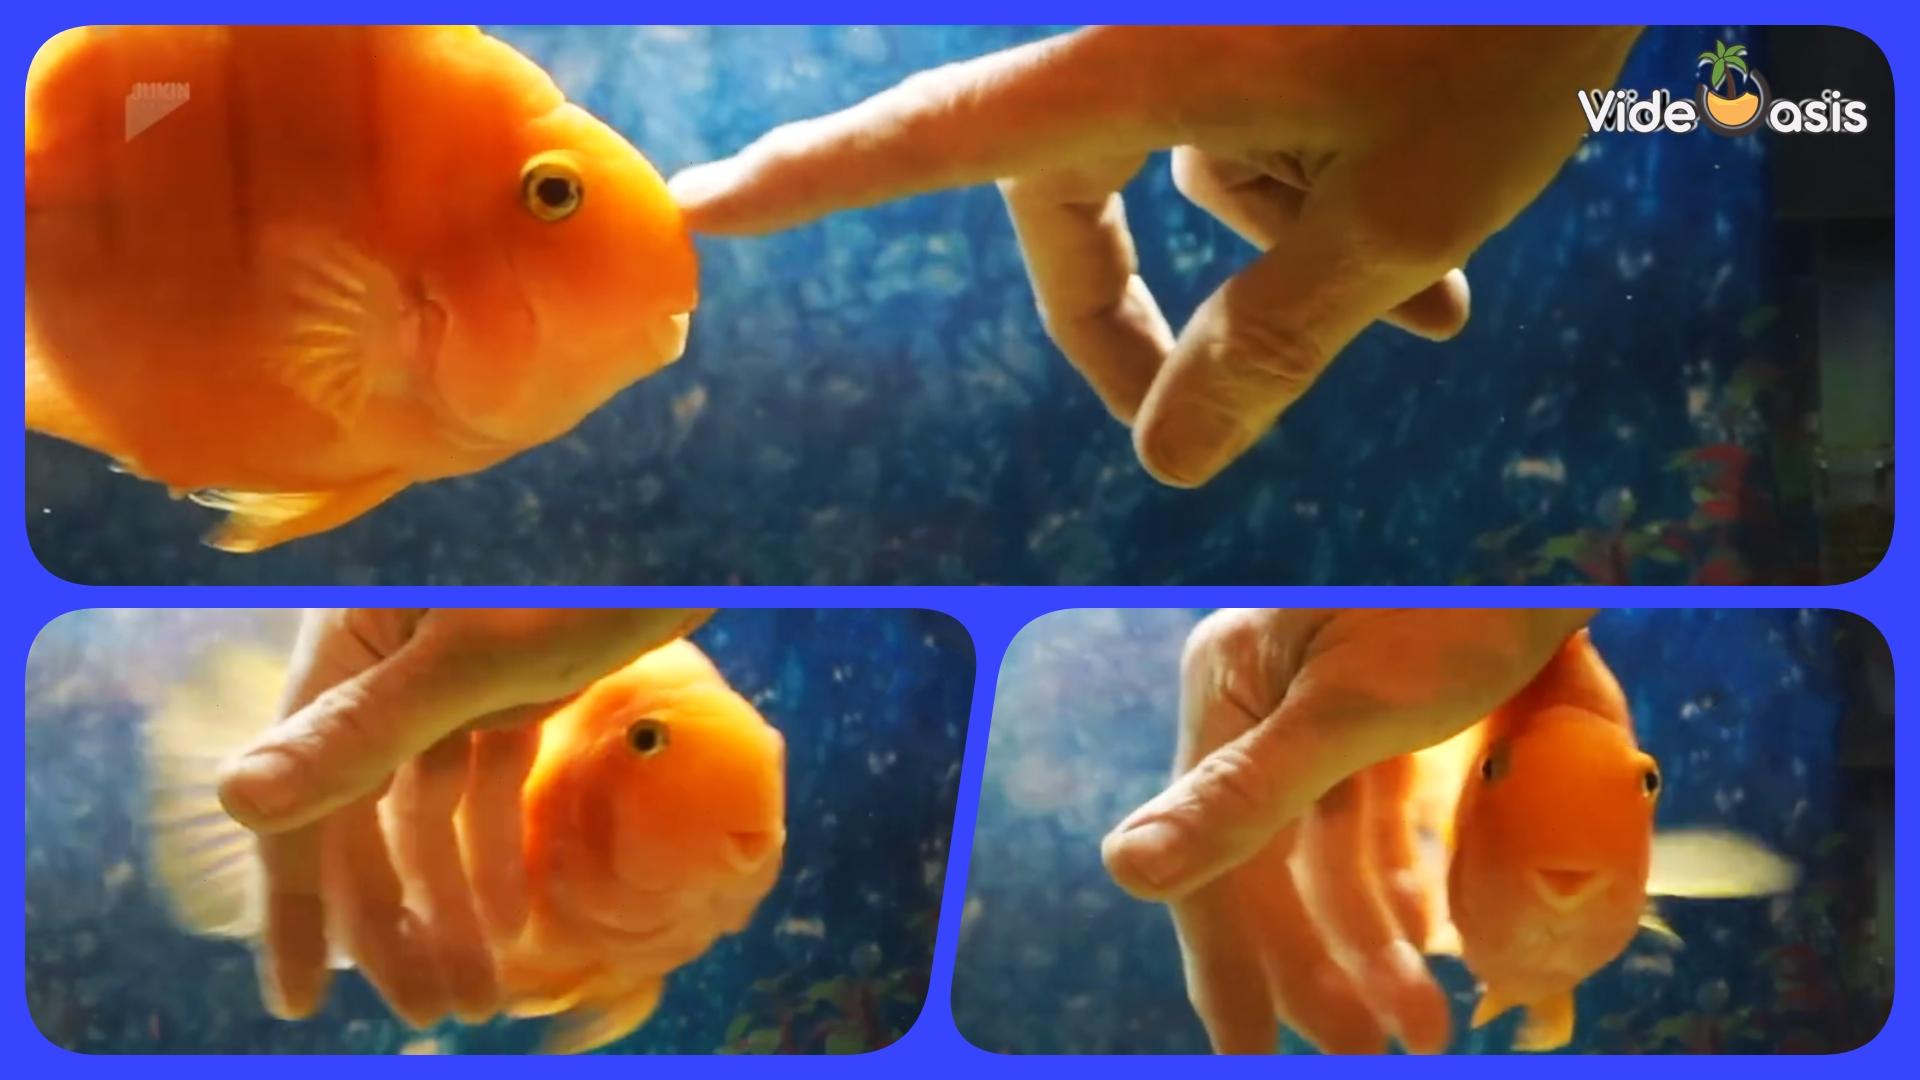 Fish Swims Between Owner's Fingers |VideOasis